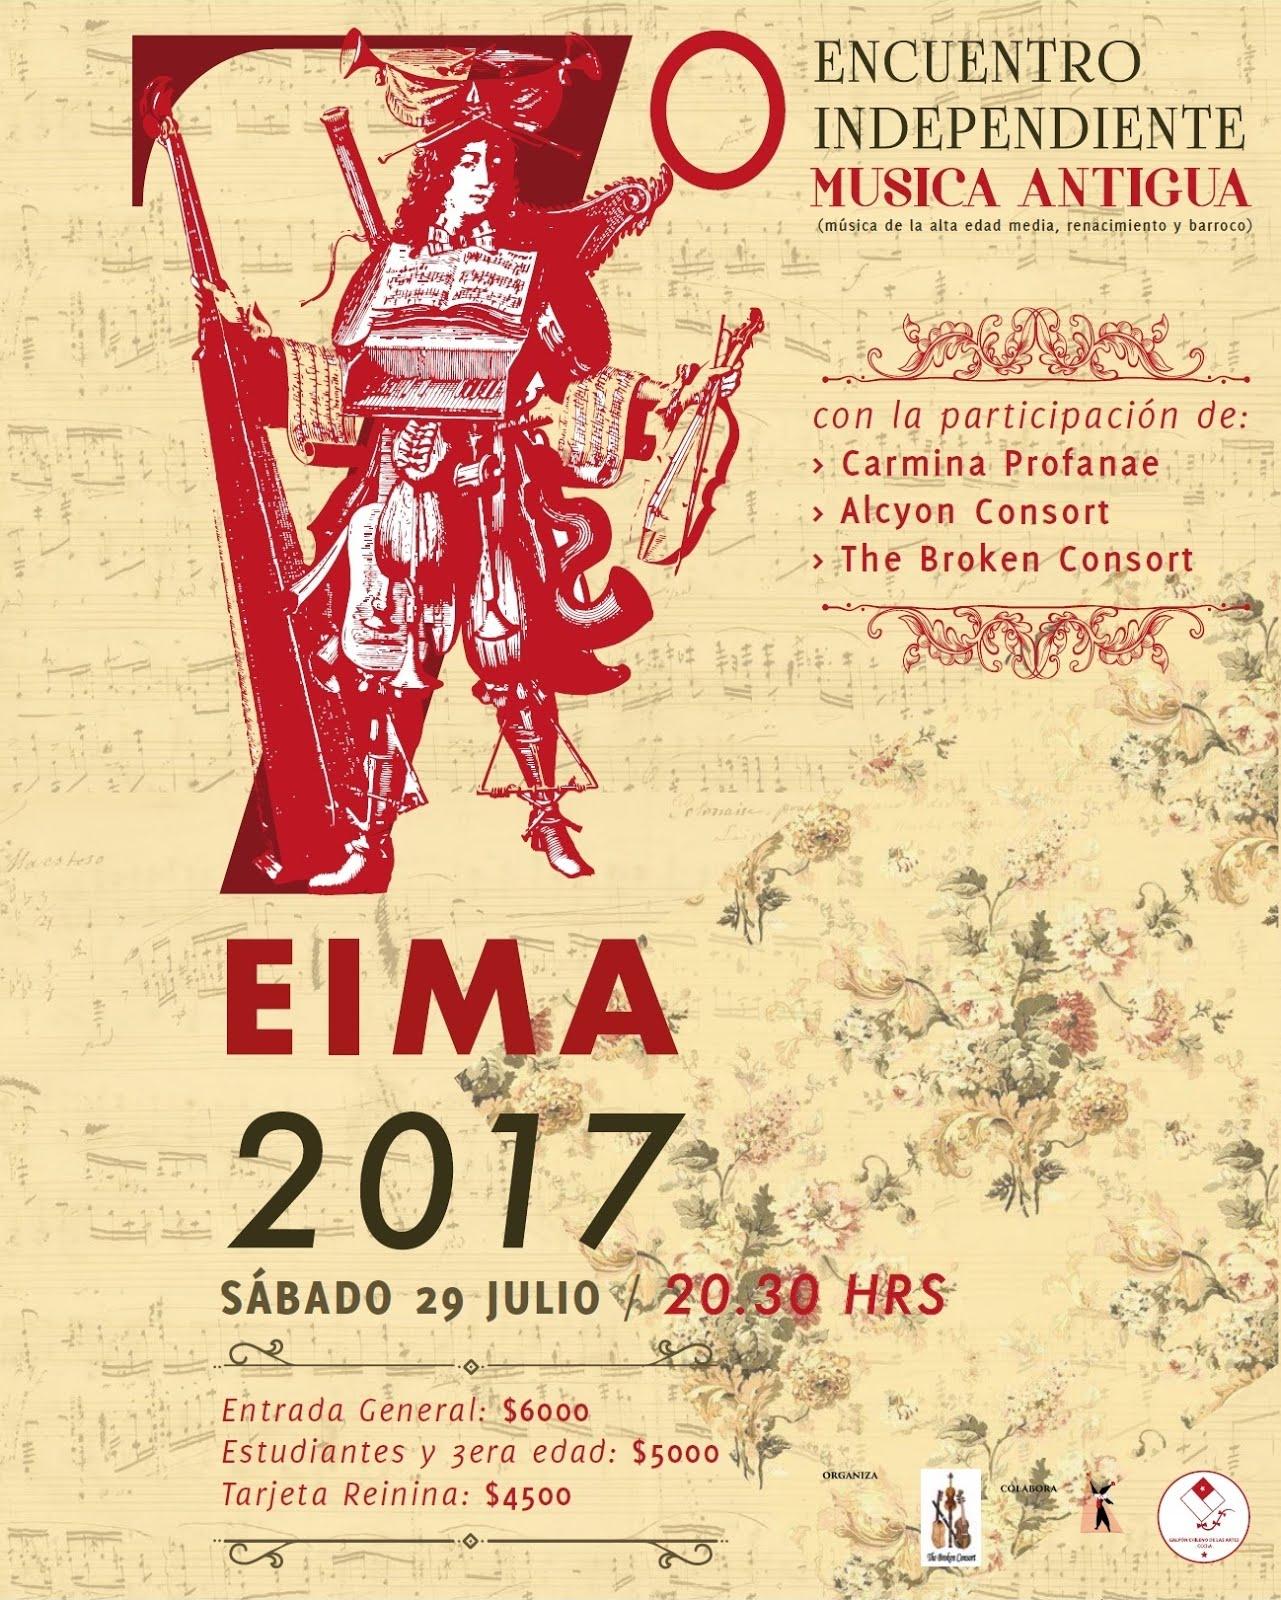 7º Encuentro Independiente de Música Antigua (EIMA 2017)